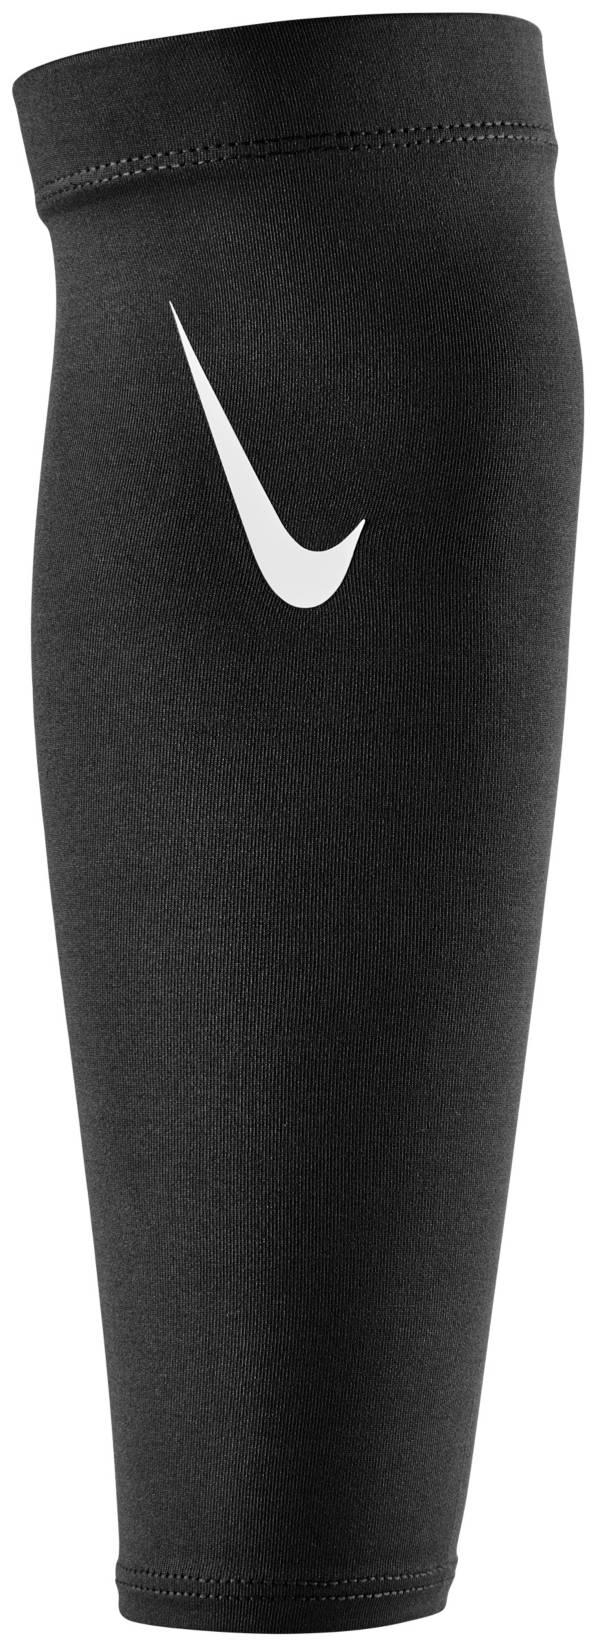 Nike Pro Adult Dri-FIT 4.0 Shivers product image